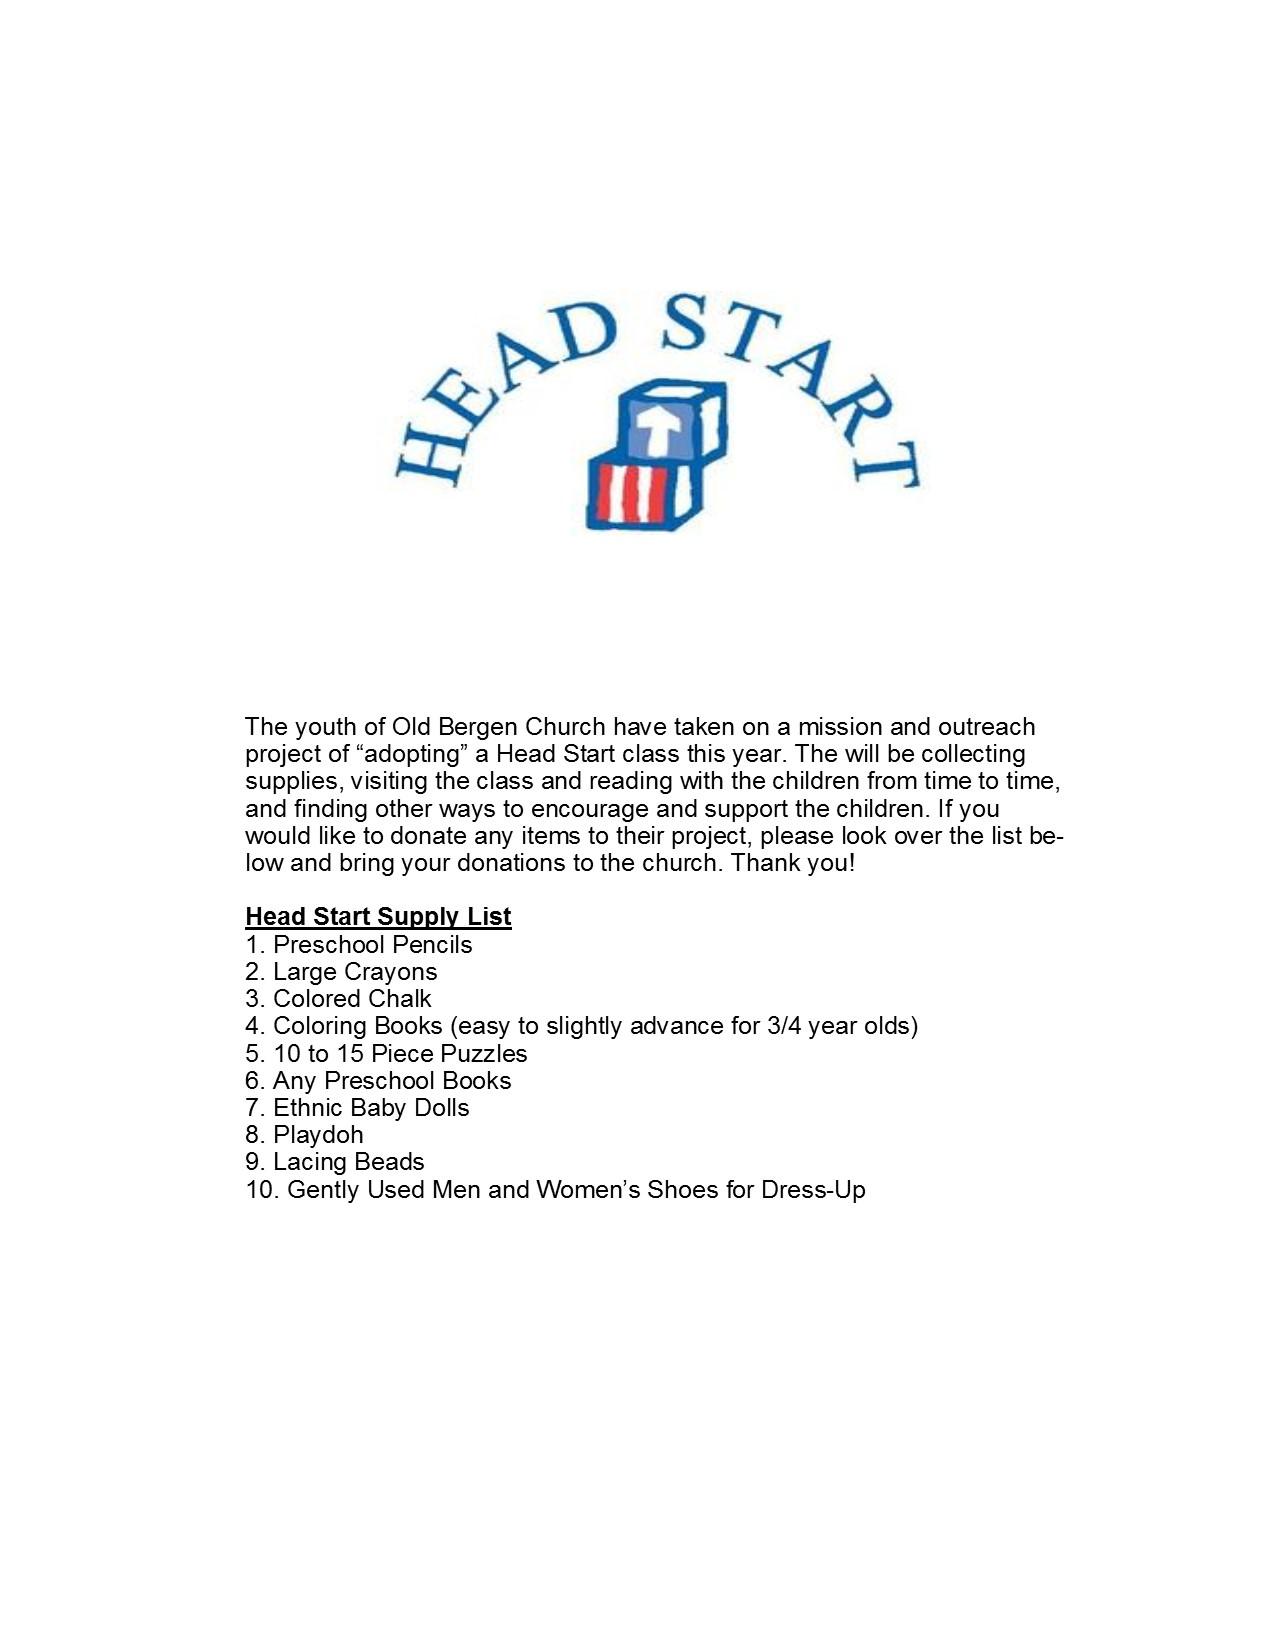 head start flyer